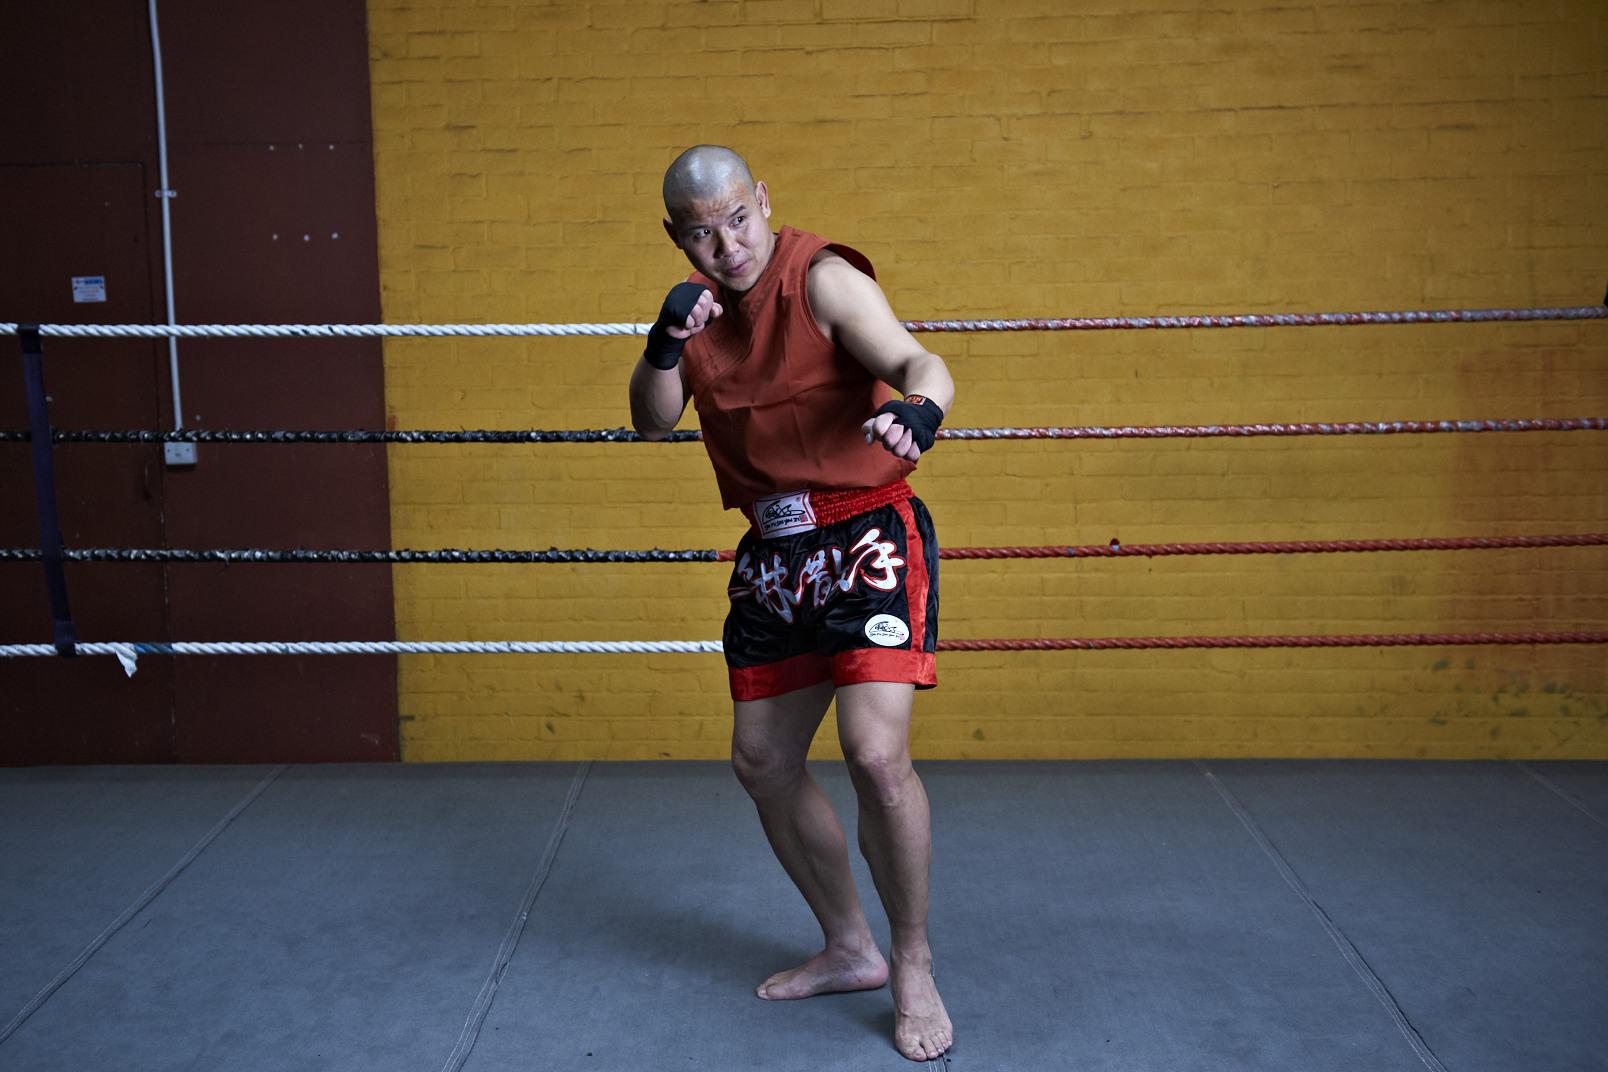 Shaolin temple uk shifu yanzi kick 29.jpg